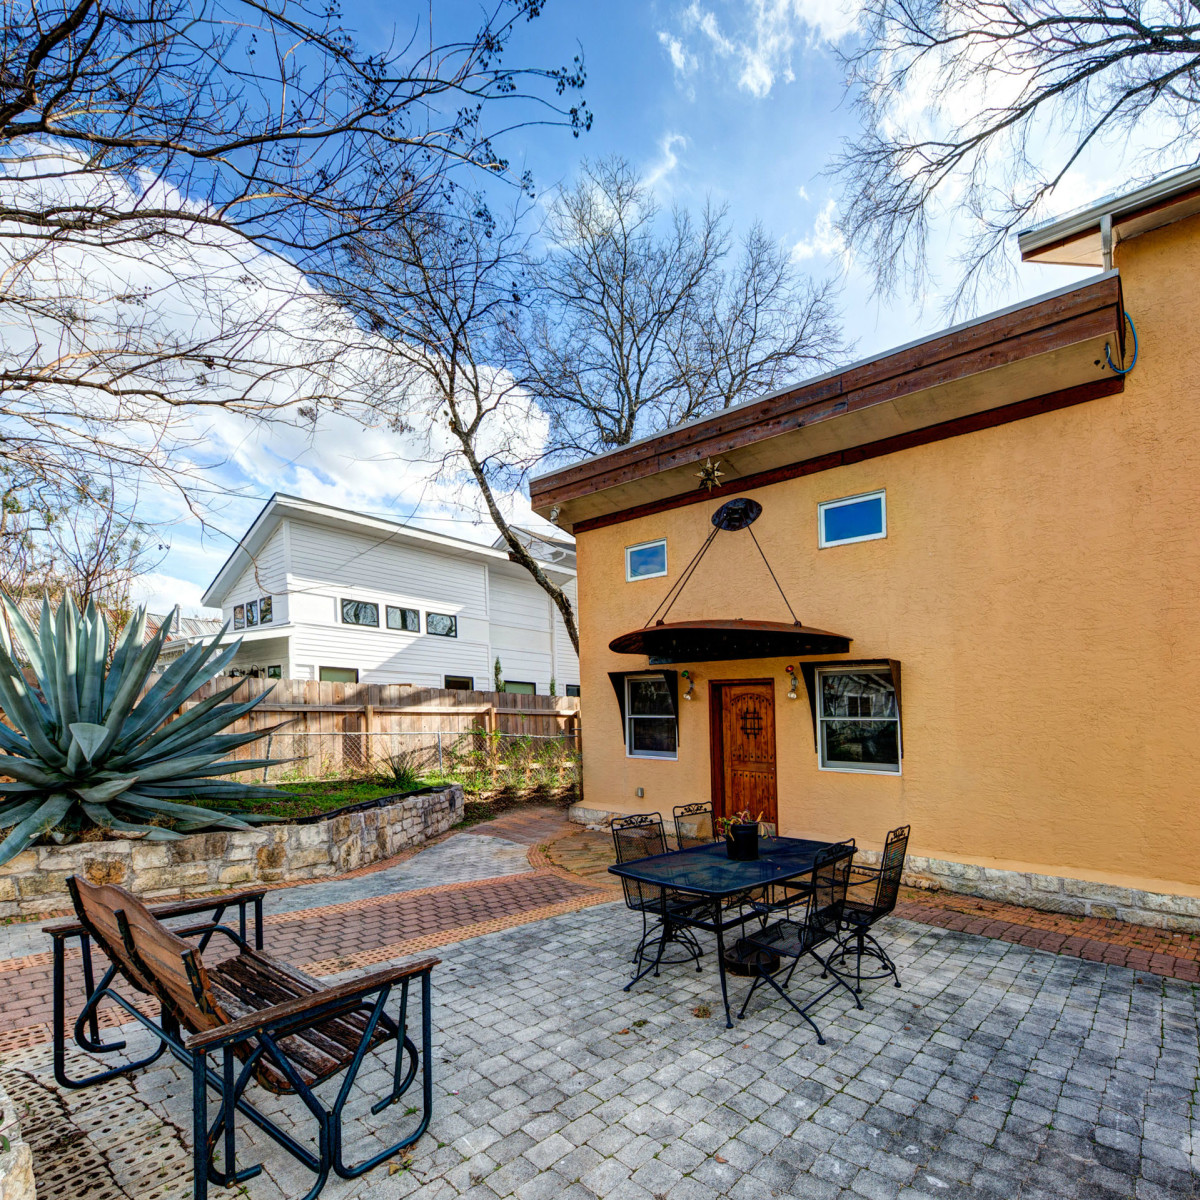 Austin home house 2105 E 9th St 78702 January 2016 exterior side